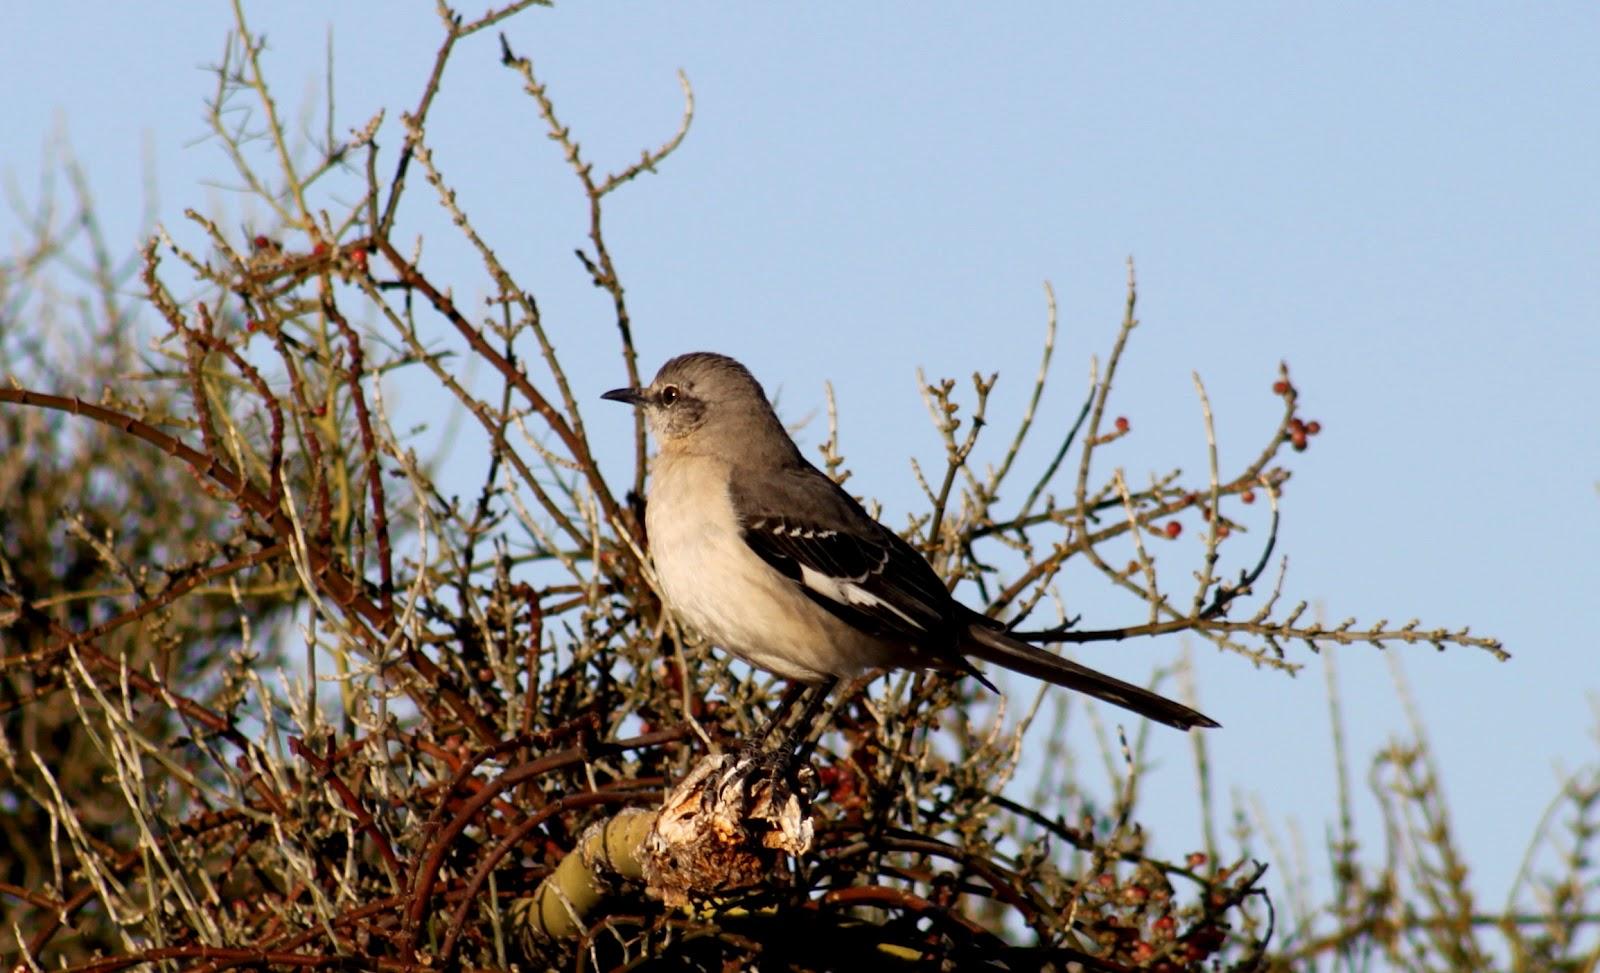 A Northern Mockingbird Mimus Polyglottos